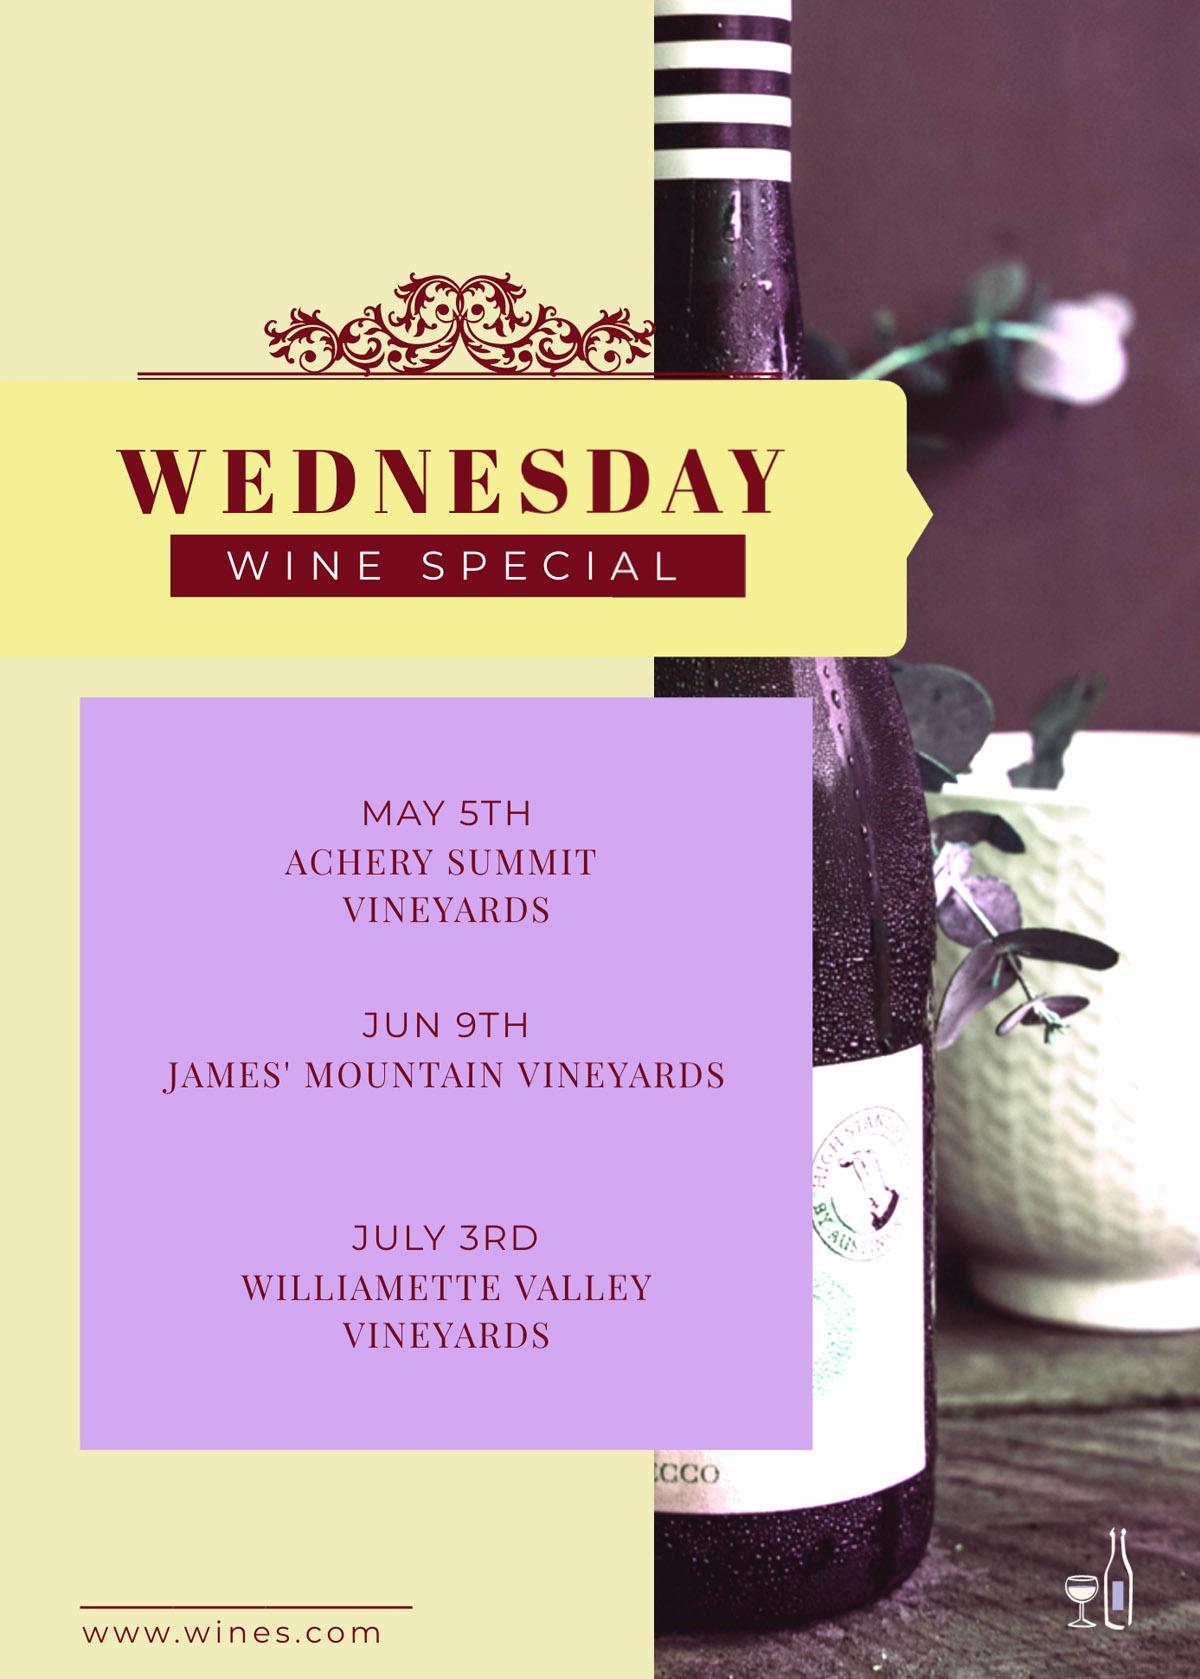 flyer templates - wine specials restaurant